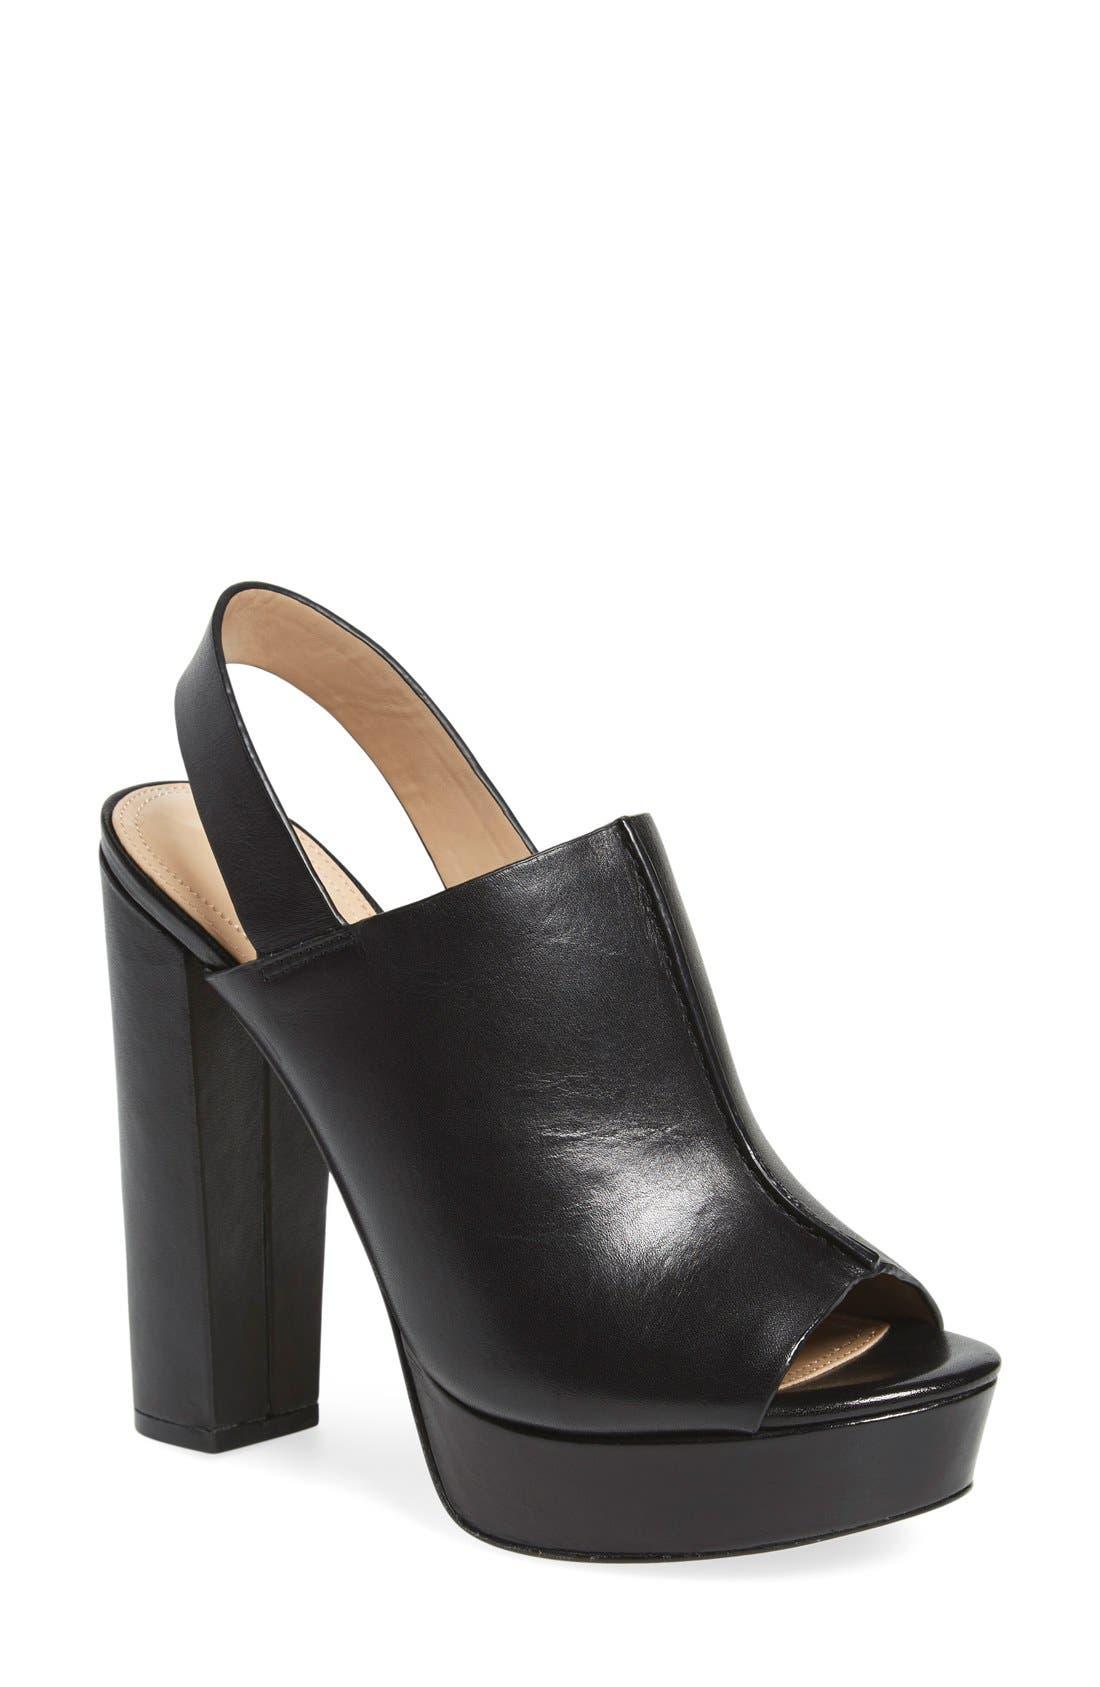 Main Image - BCBGMAXAZRIA 'Dune' Platform Sandal (Women)